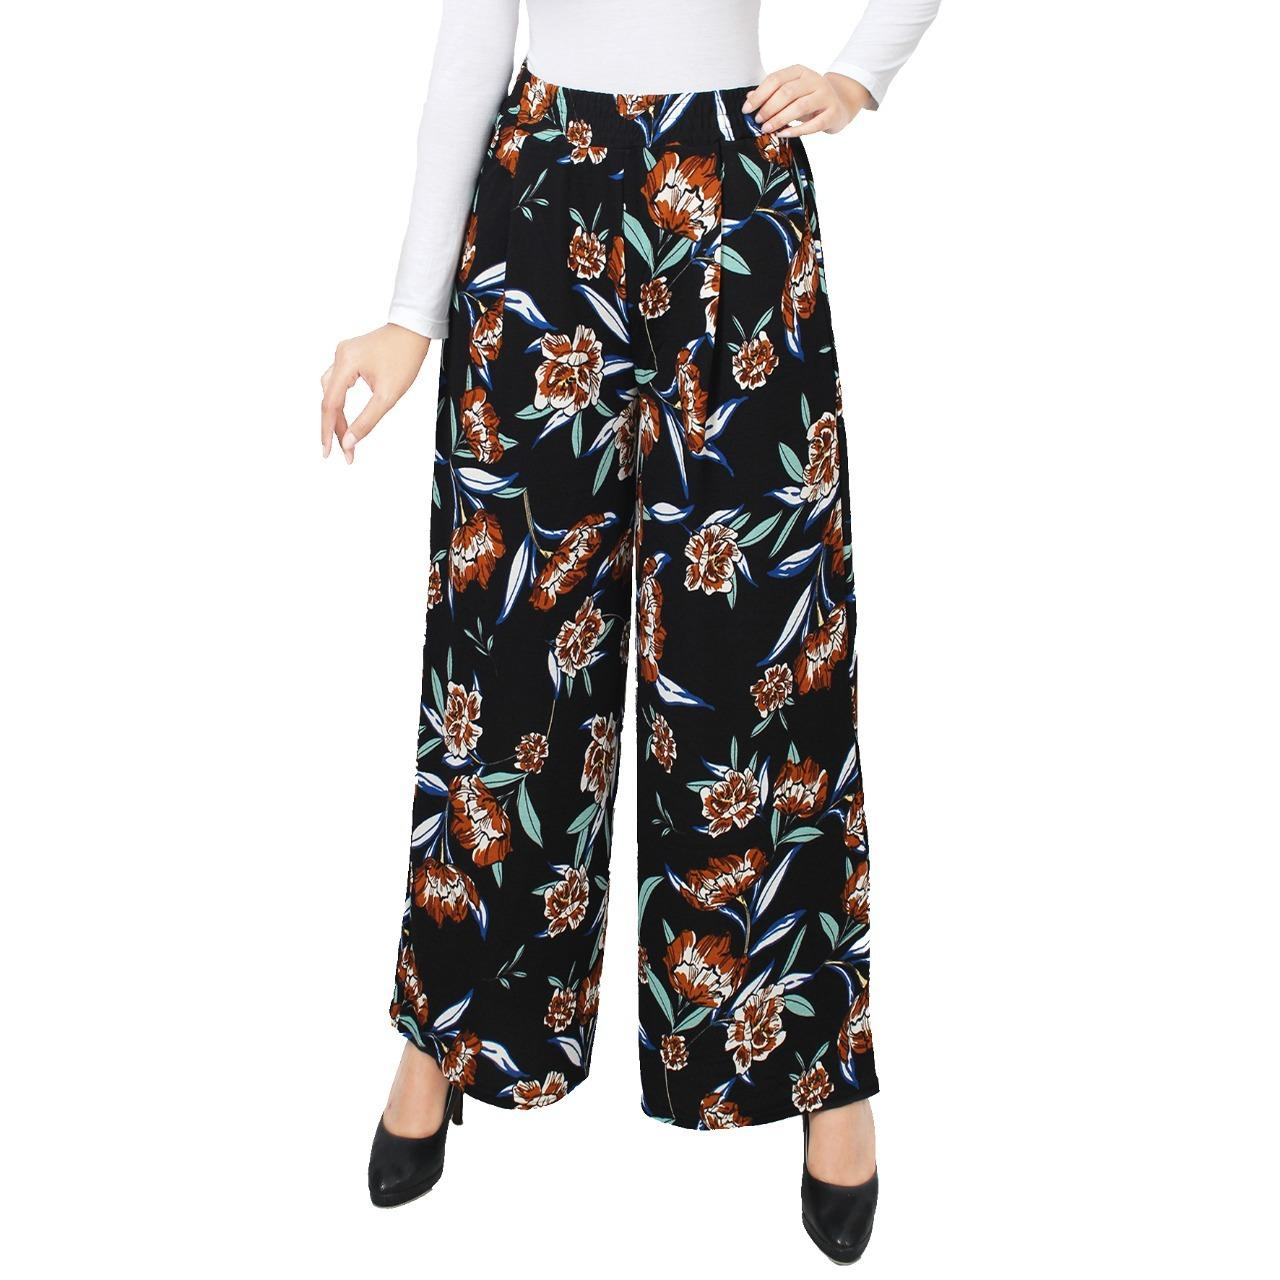 Penjualan GLM - Celana Kulot - Kulot Basic Panjang - Mawar Hitam terbaik murah - Hanya Rp73.668